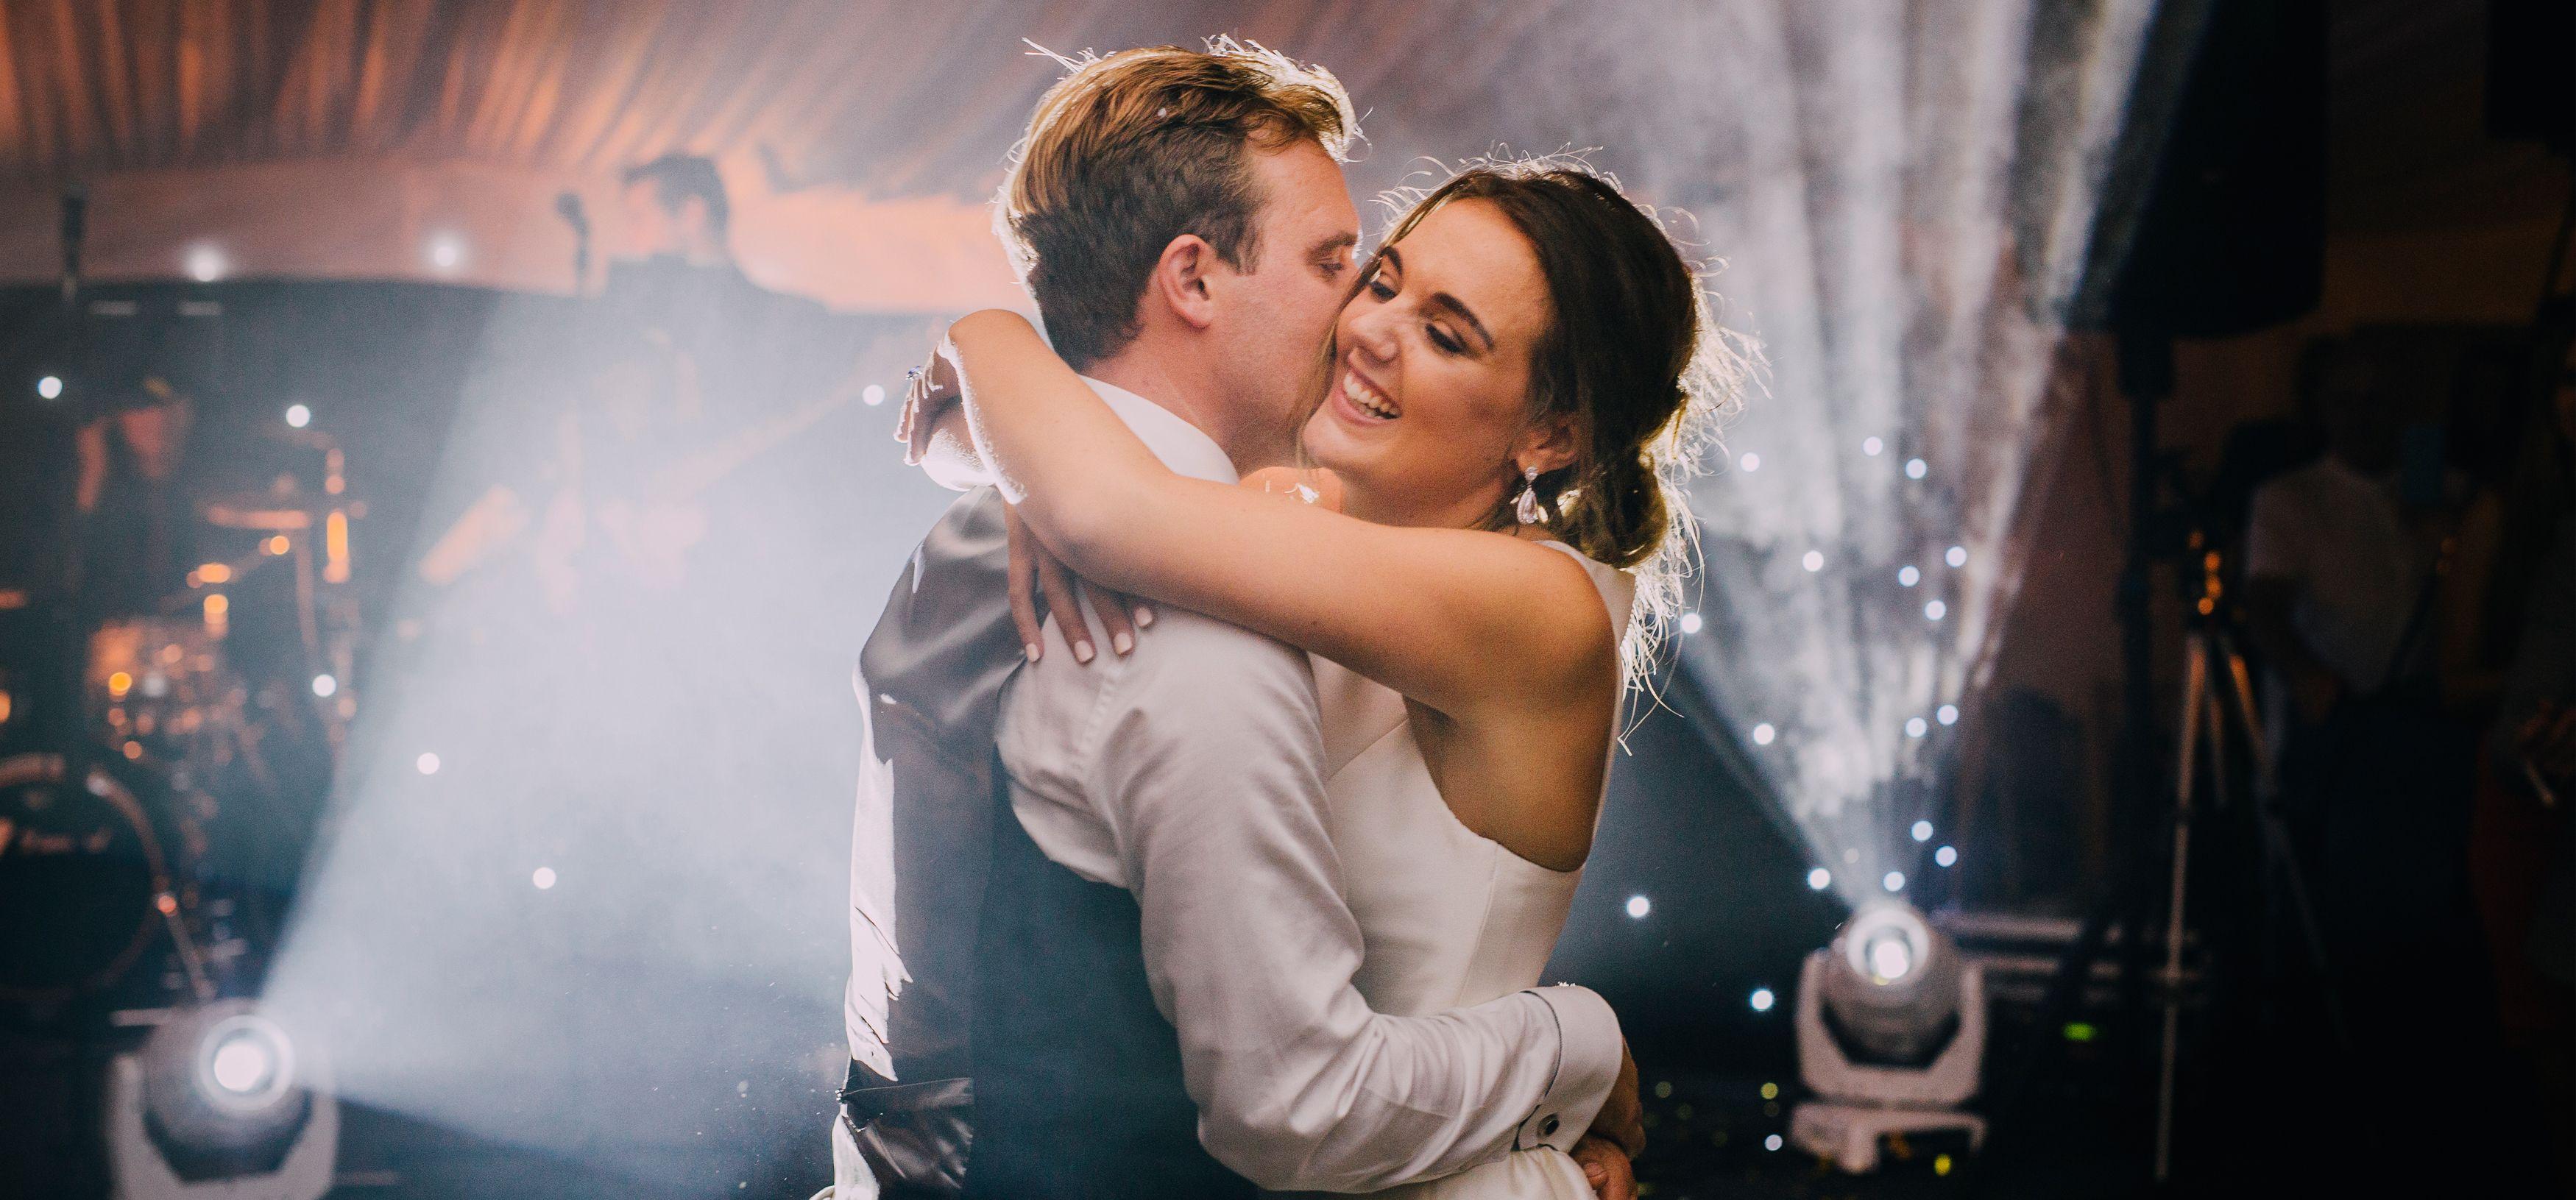 wedding first dance Digital photography backdrops